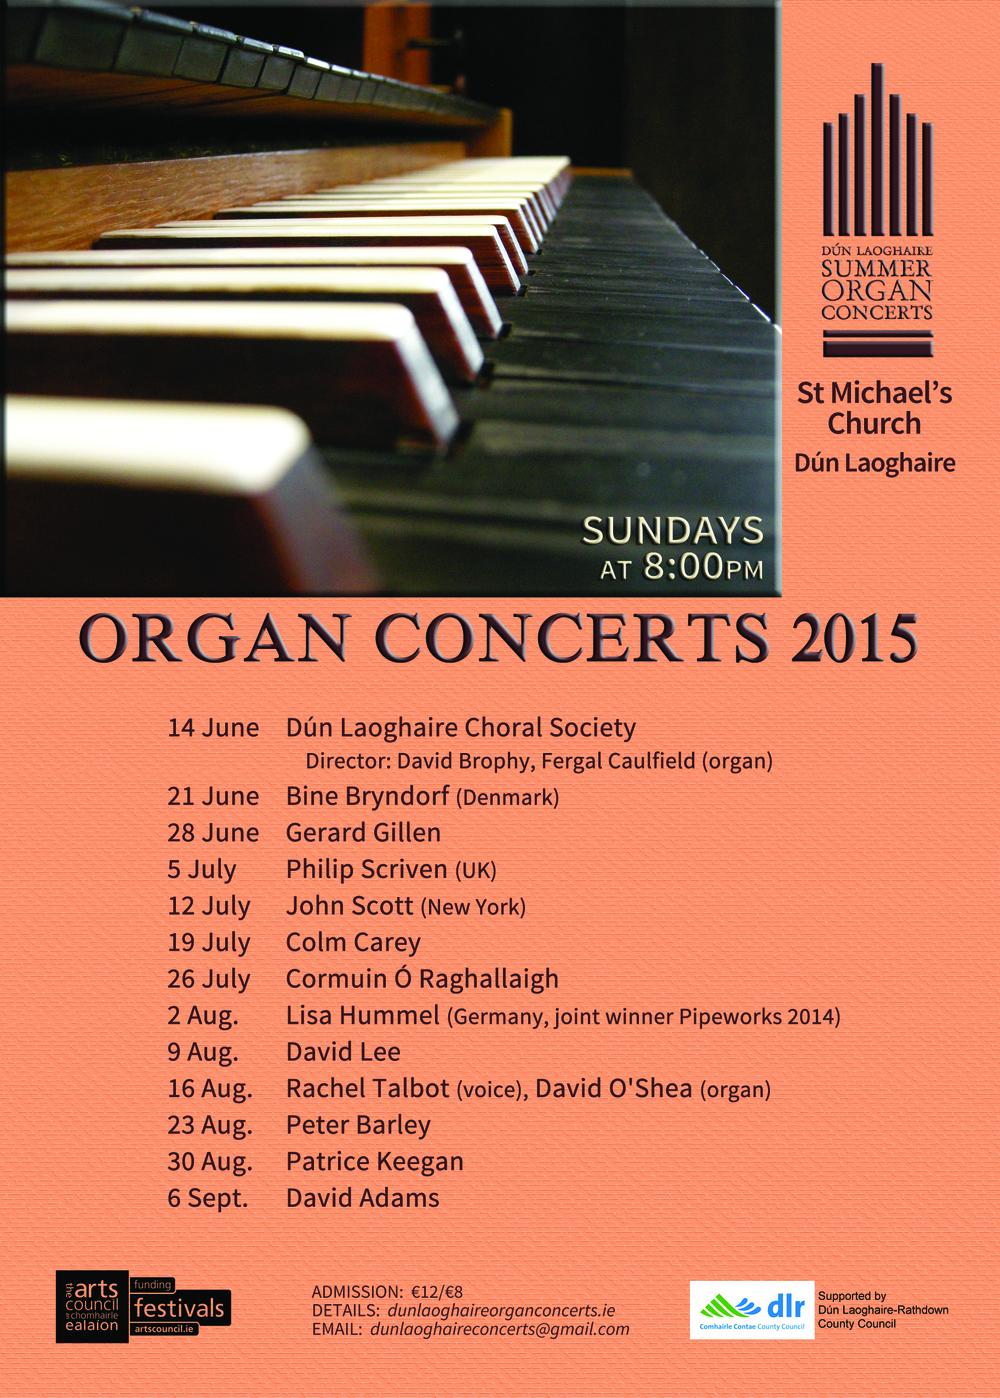 dun laoghaire organ series opening concert 14 june 2015